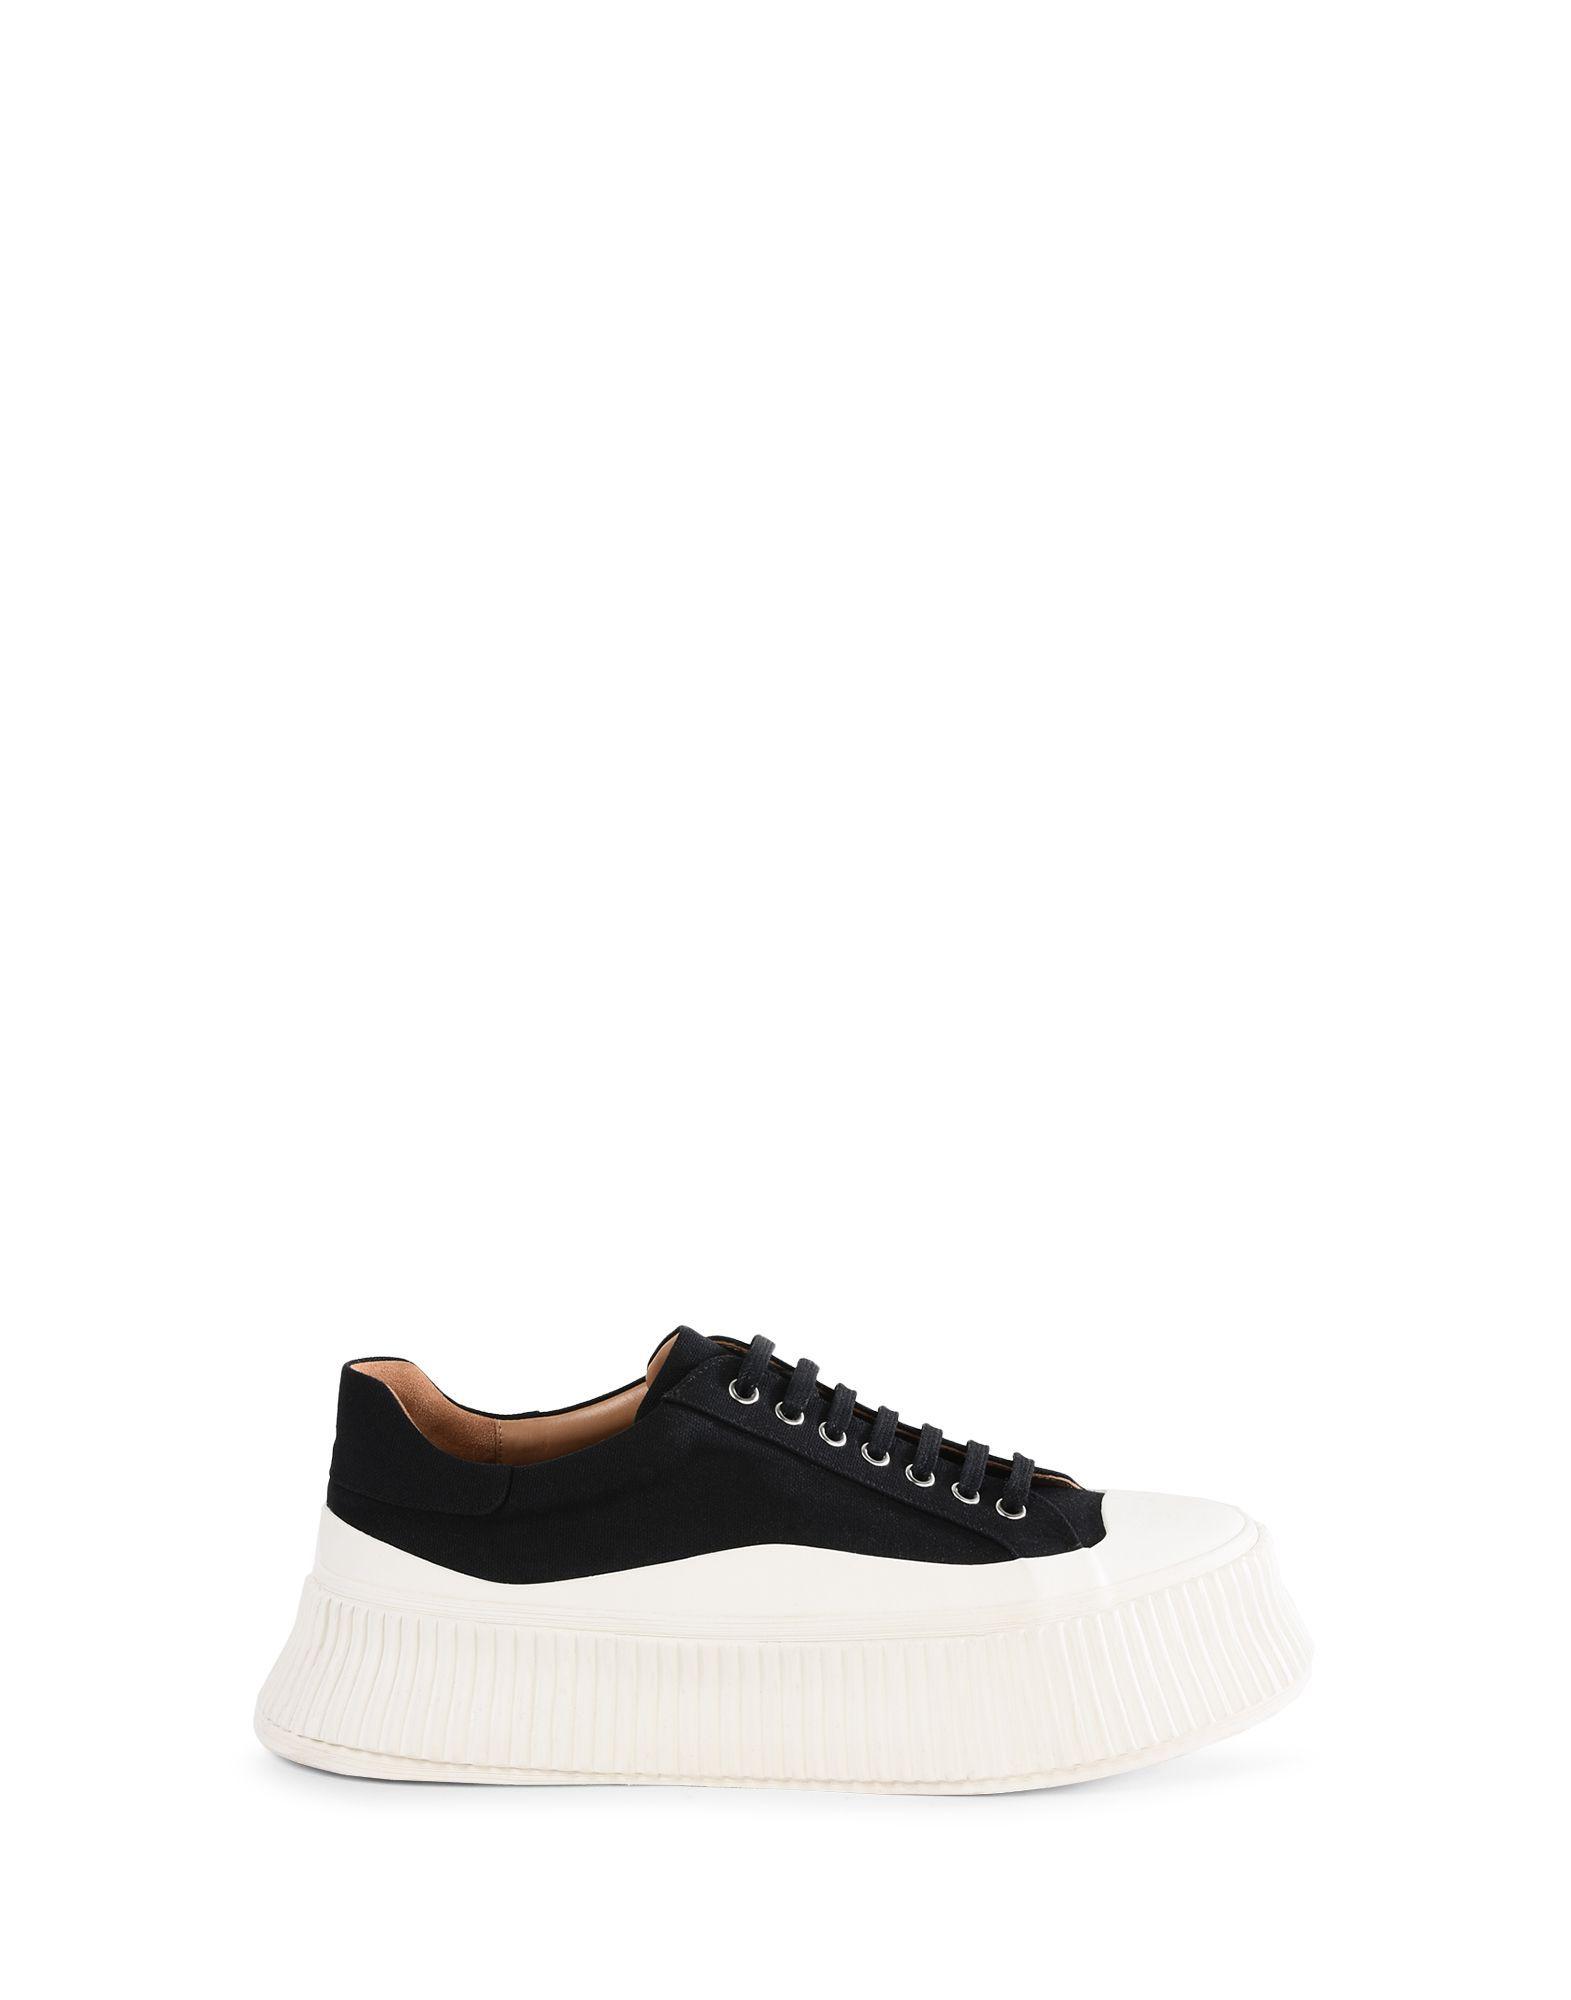 JIL SANDER SNEAKERS SCHWARZ. #jilsander #shoes | Sneakers